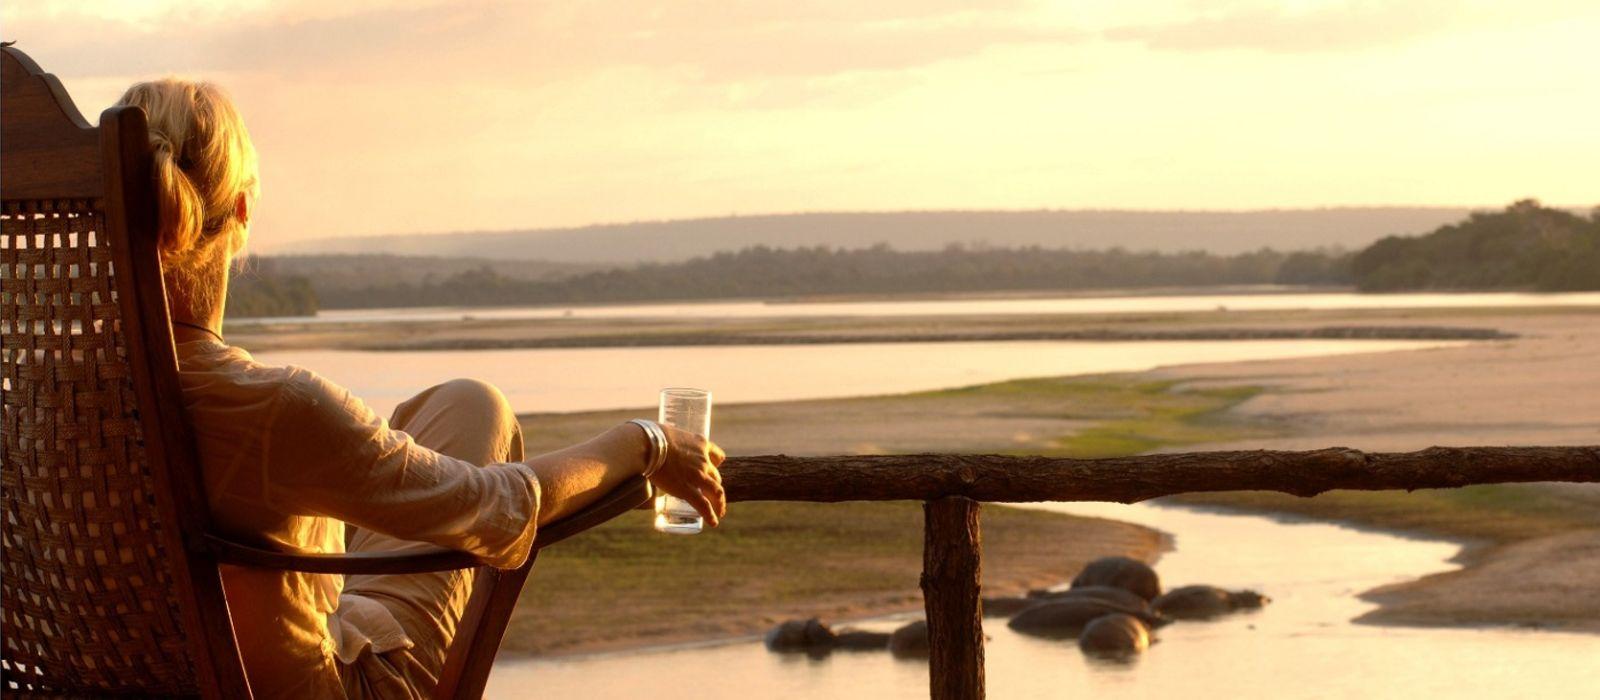 Tanzania Luxusreise – Safari-Abenteuer & Strandparadies Urlaub 5